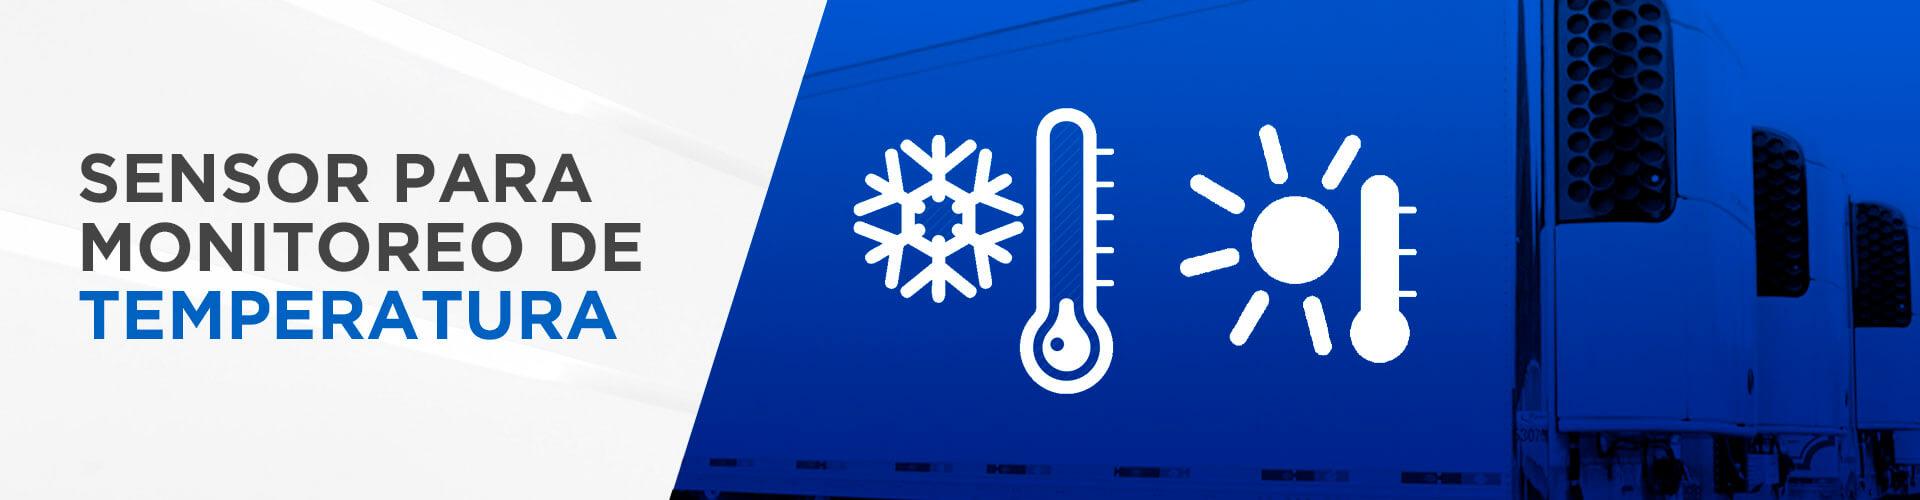 telematica-sensor-temperatura